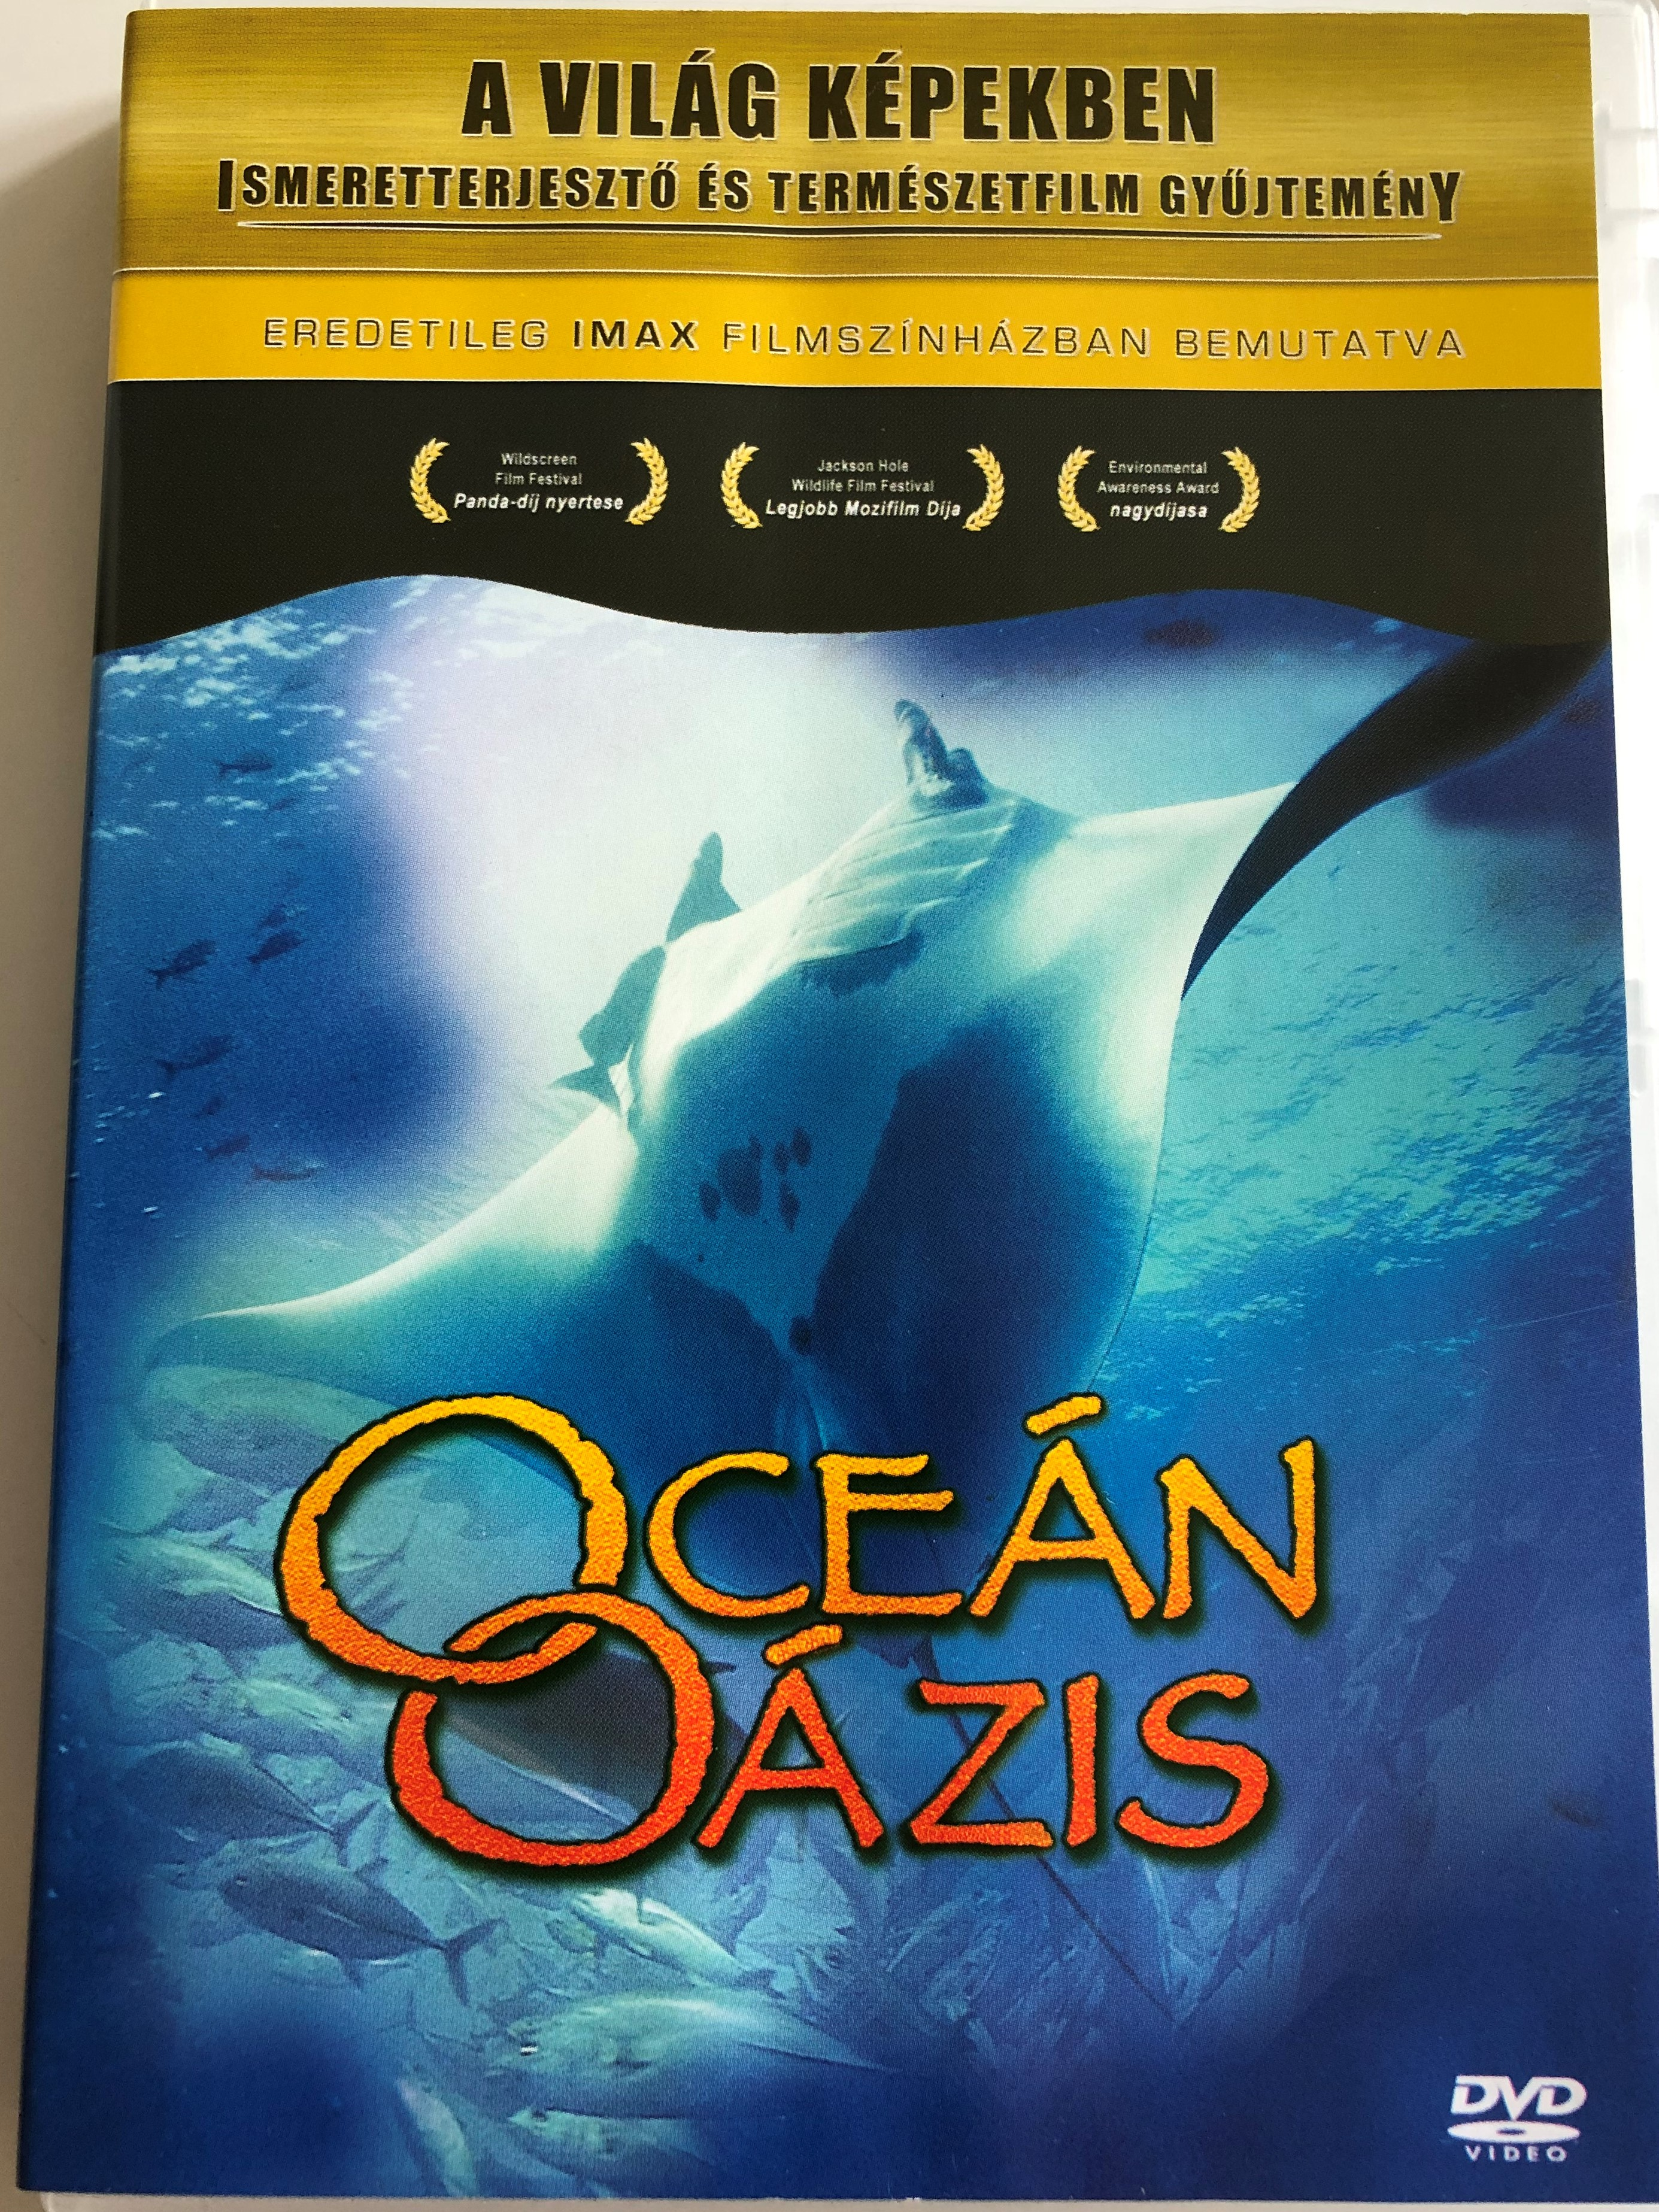 ocean-oasis-dvd-2001-oce-n-o-zis-directed-by-soames-summerhays-michael-hager-don-steele-documentary-about-ocean-wildlife-1-.jpg